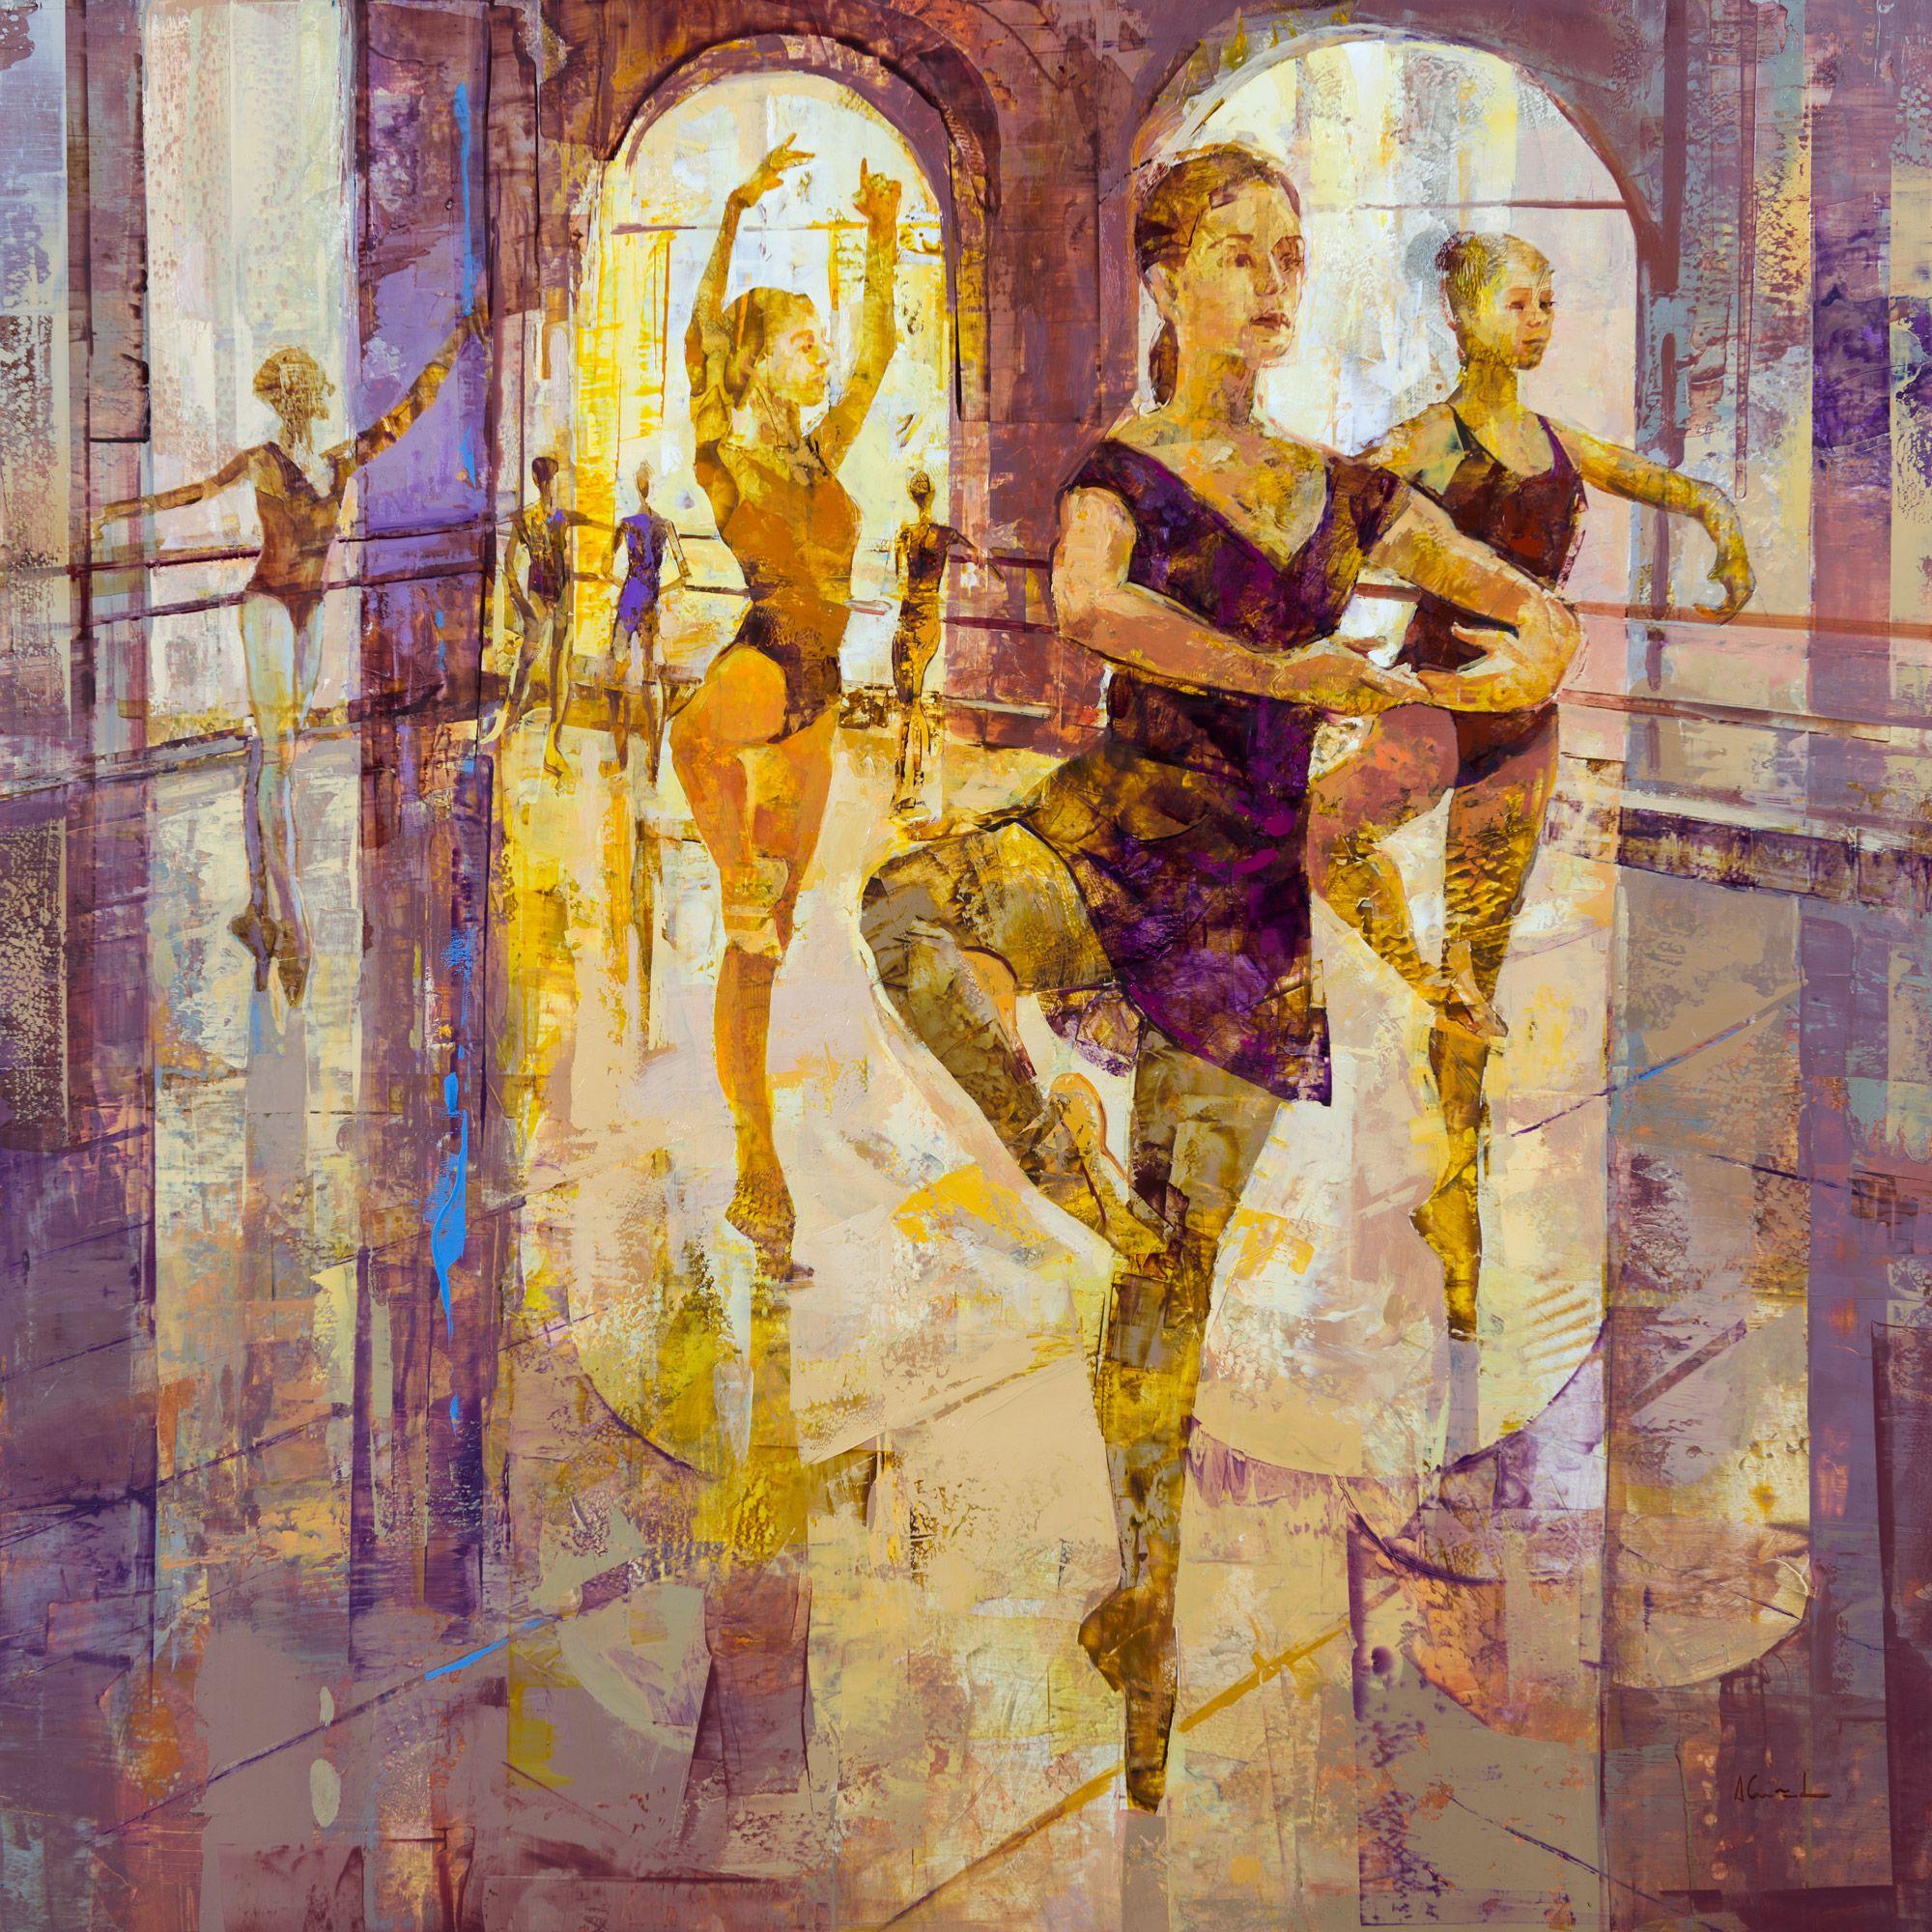 Oil on panel Alfonso Cuñado Spain. 100x100 cm